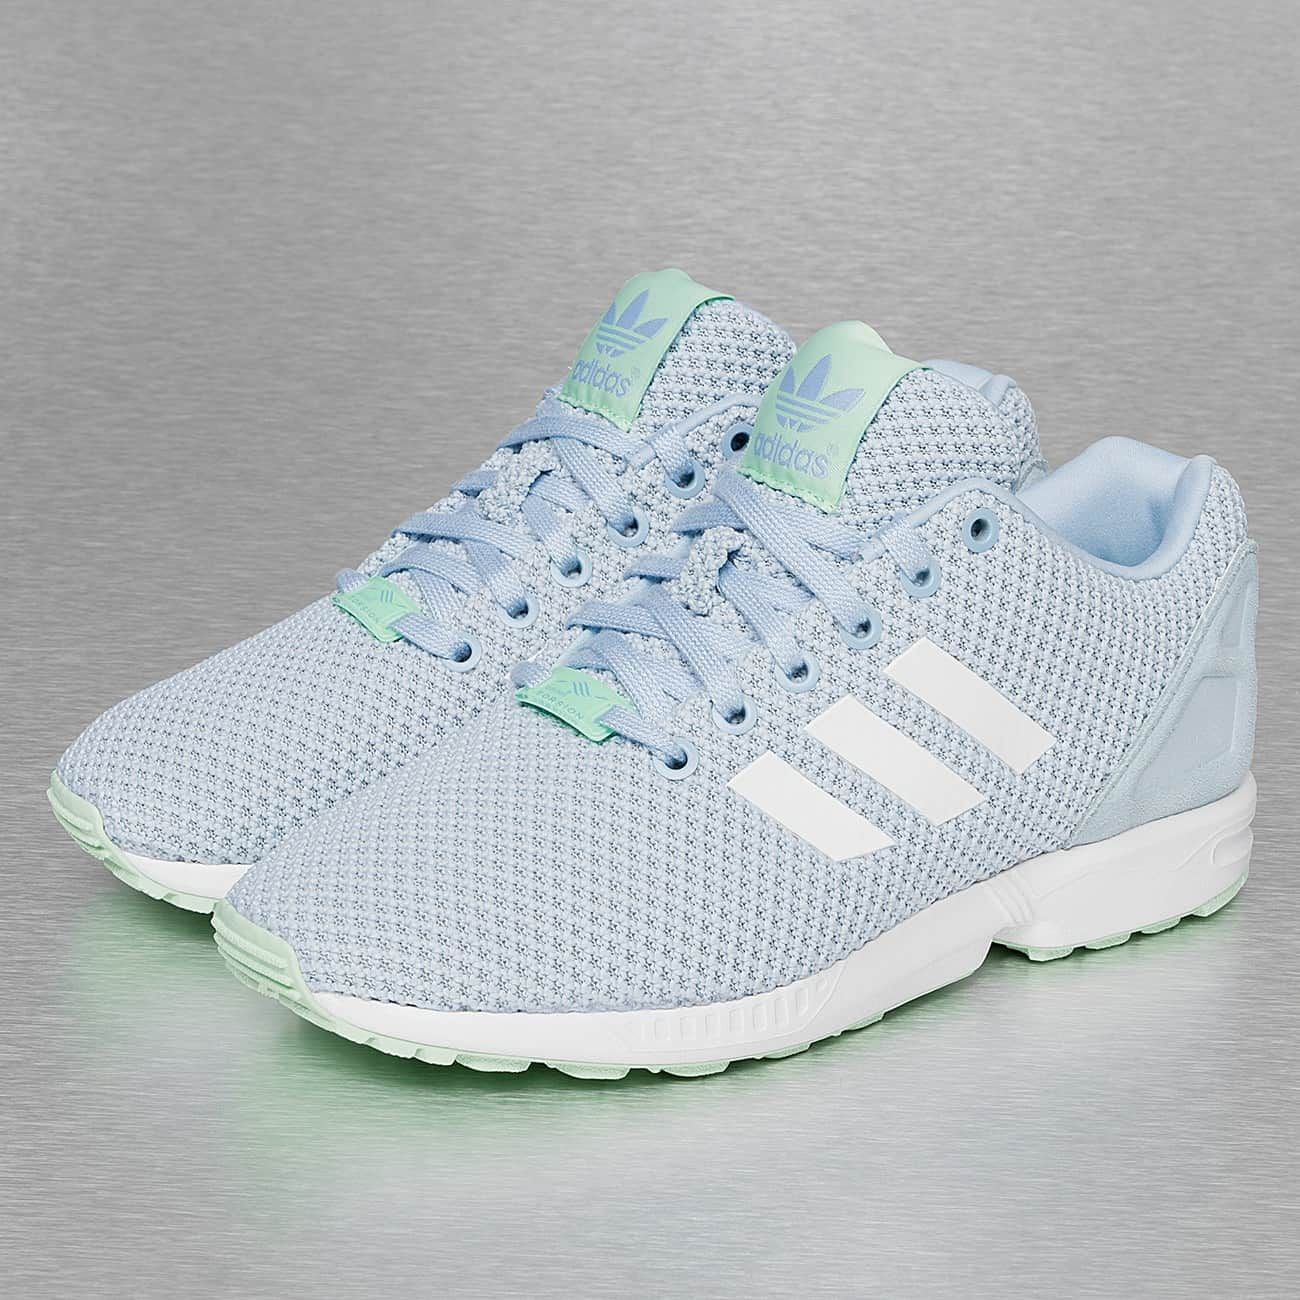 adidas Sneaker blau | Adidas schuhe, Adidas sneaker, Schuhe